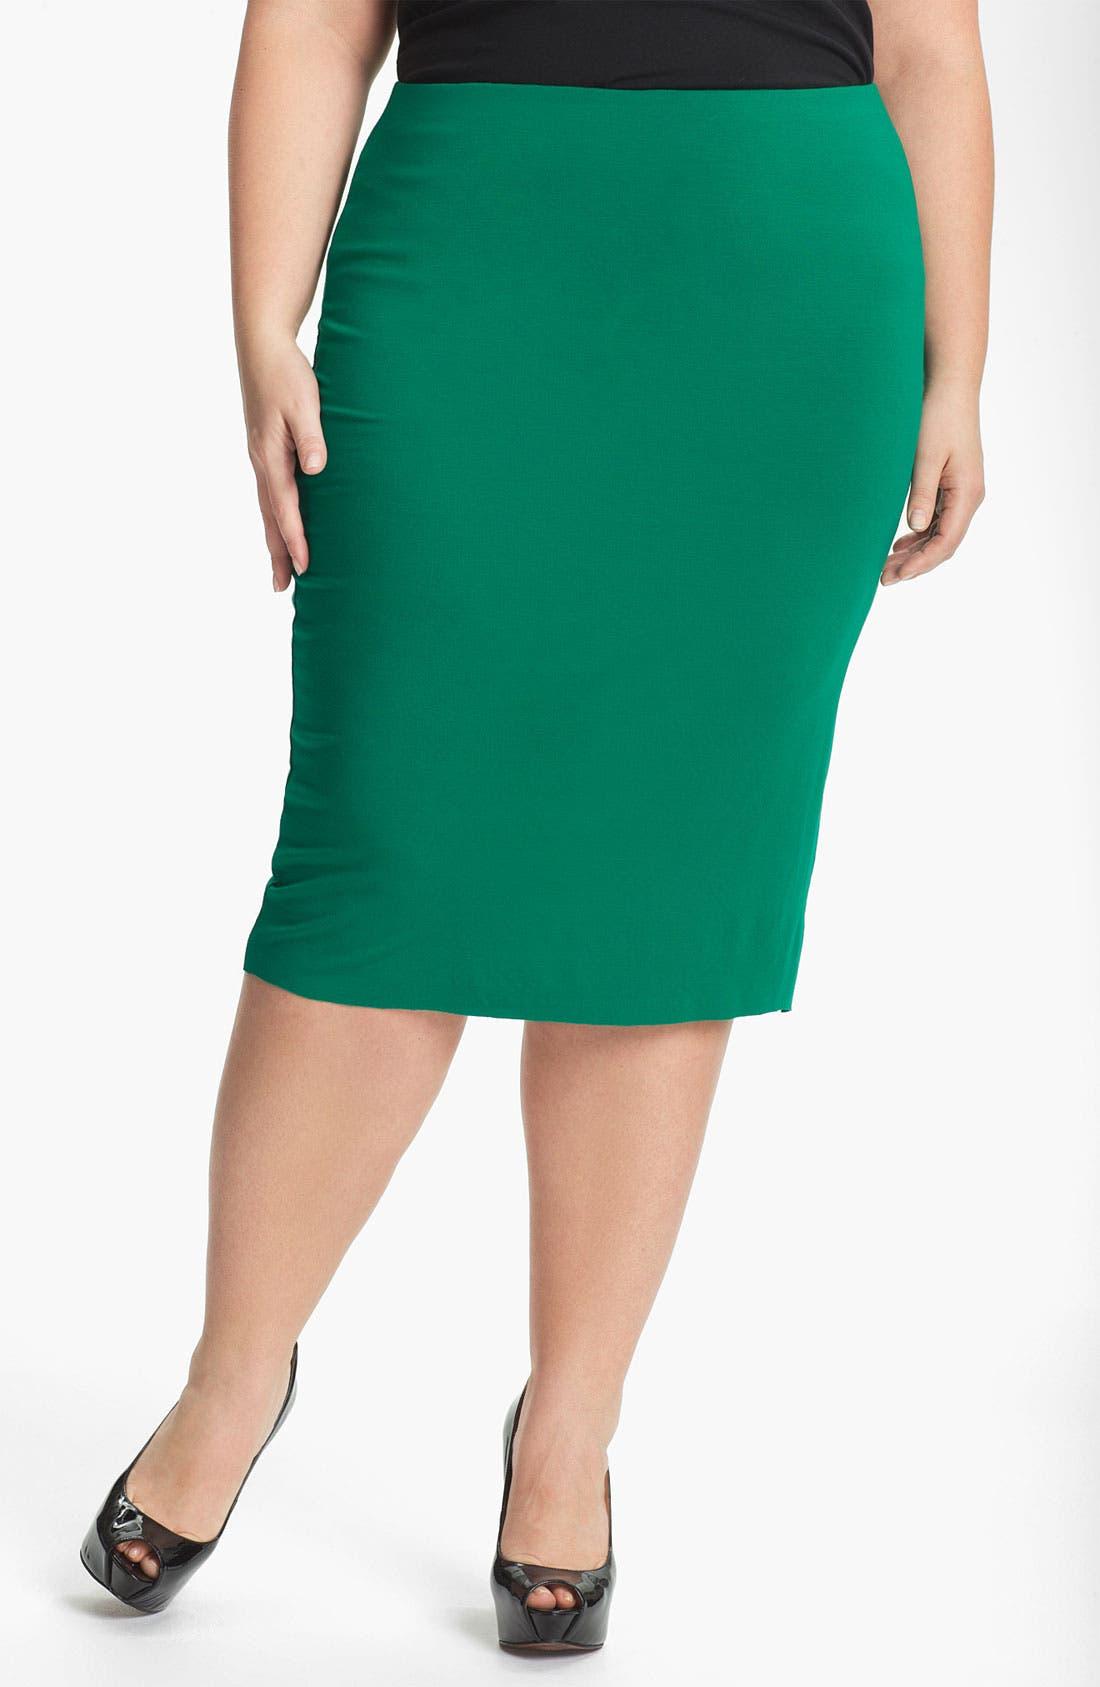 Alternate Image 1 Selected - Vince Camuto Midi Tube Skirt (Plus)